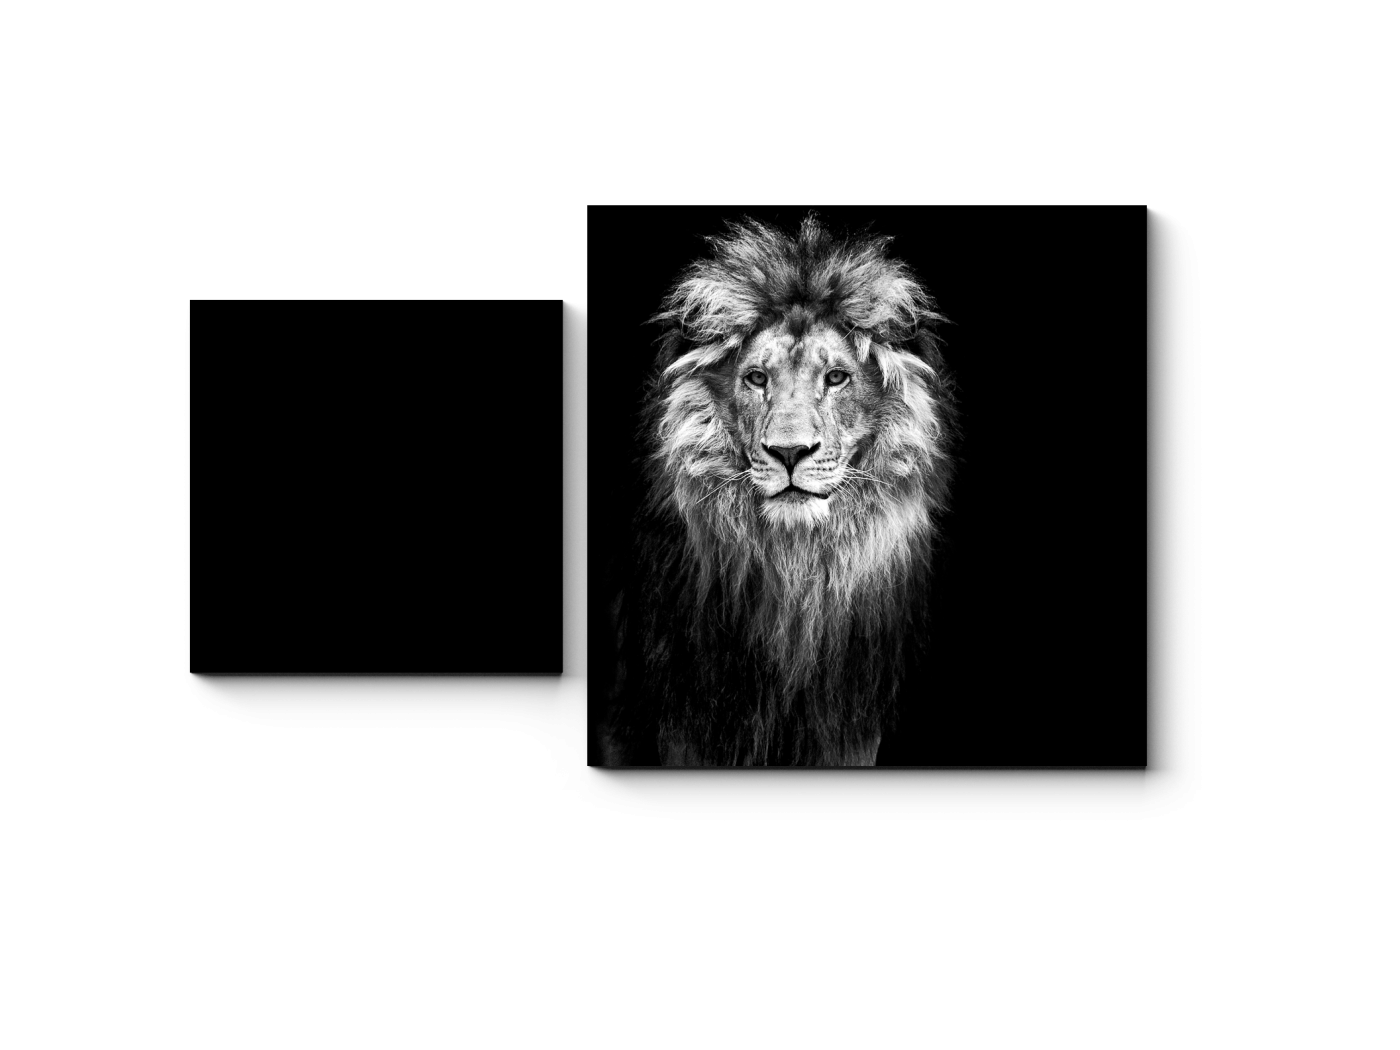 Модульная картина Портрет льва в темноте (50x30) фото